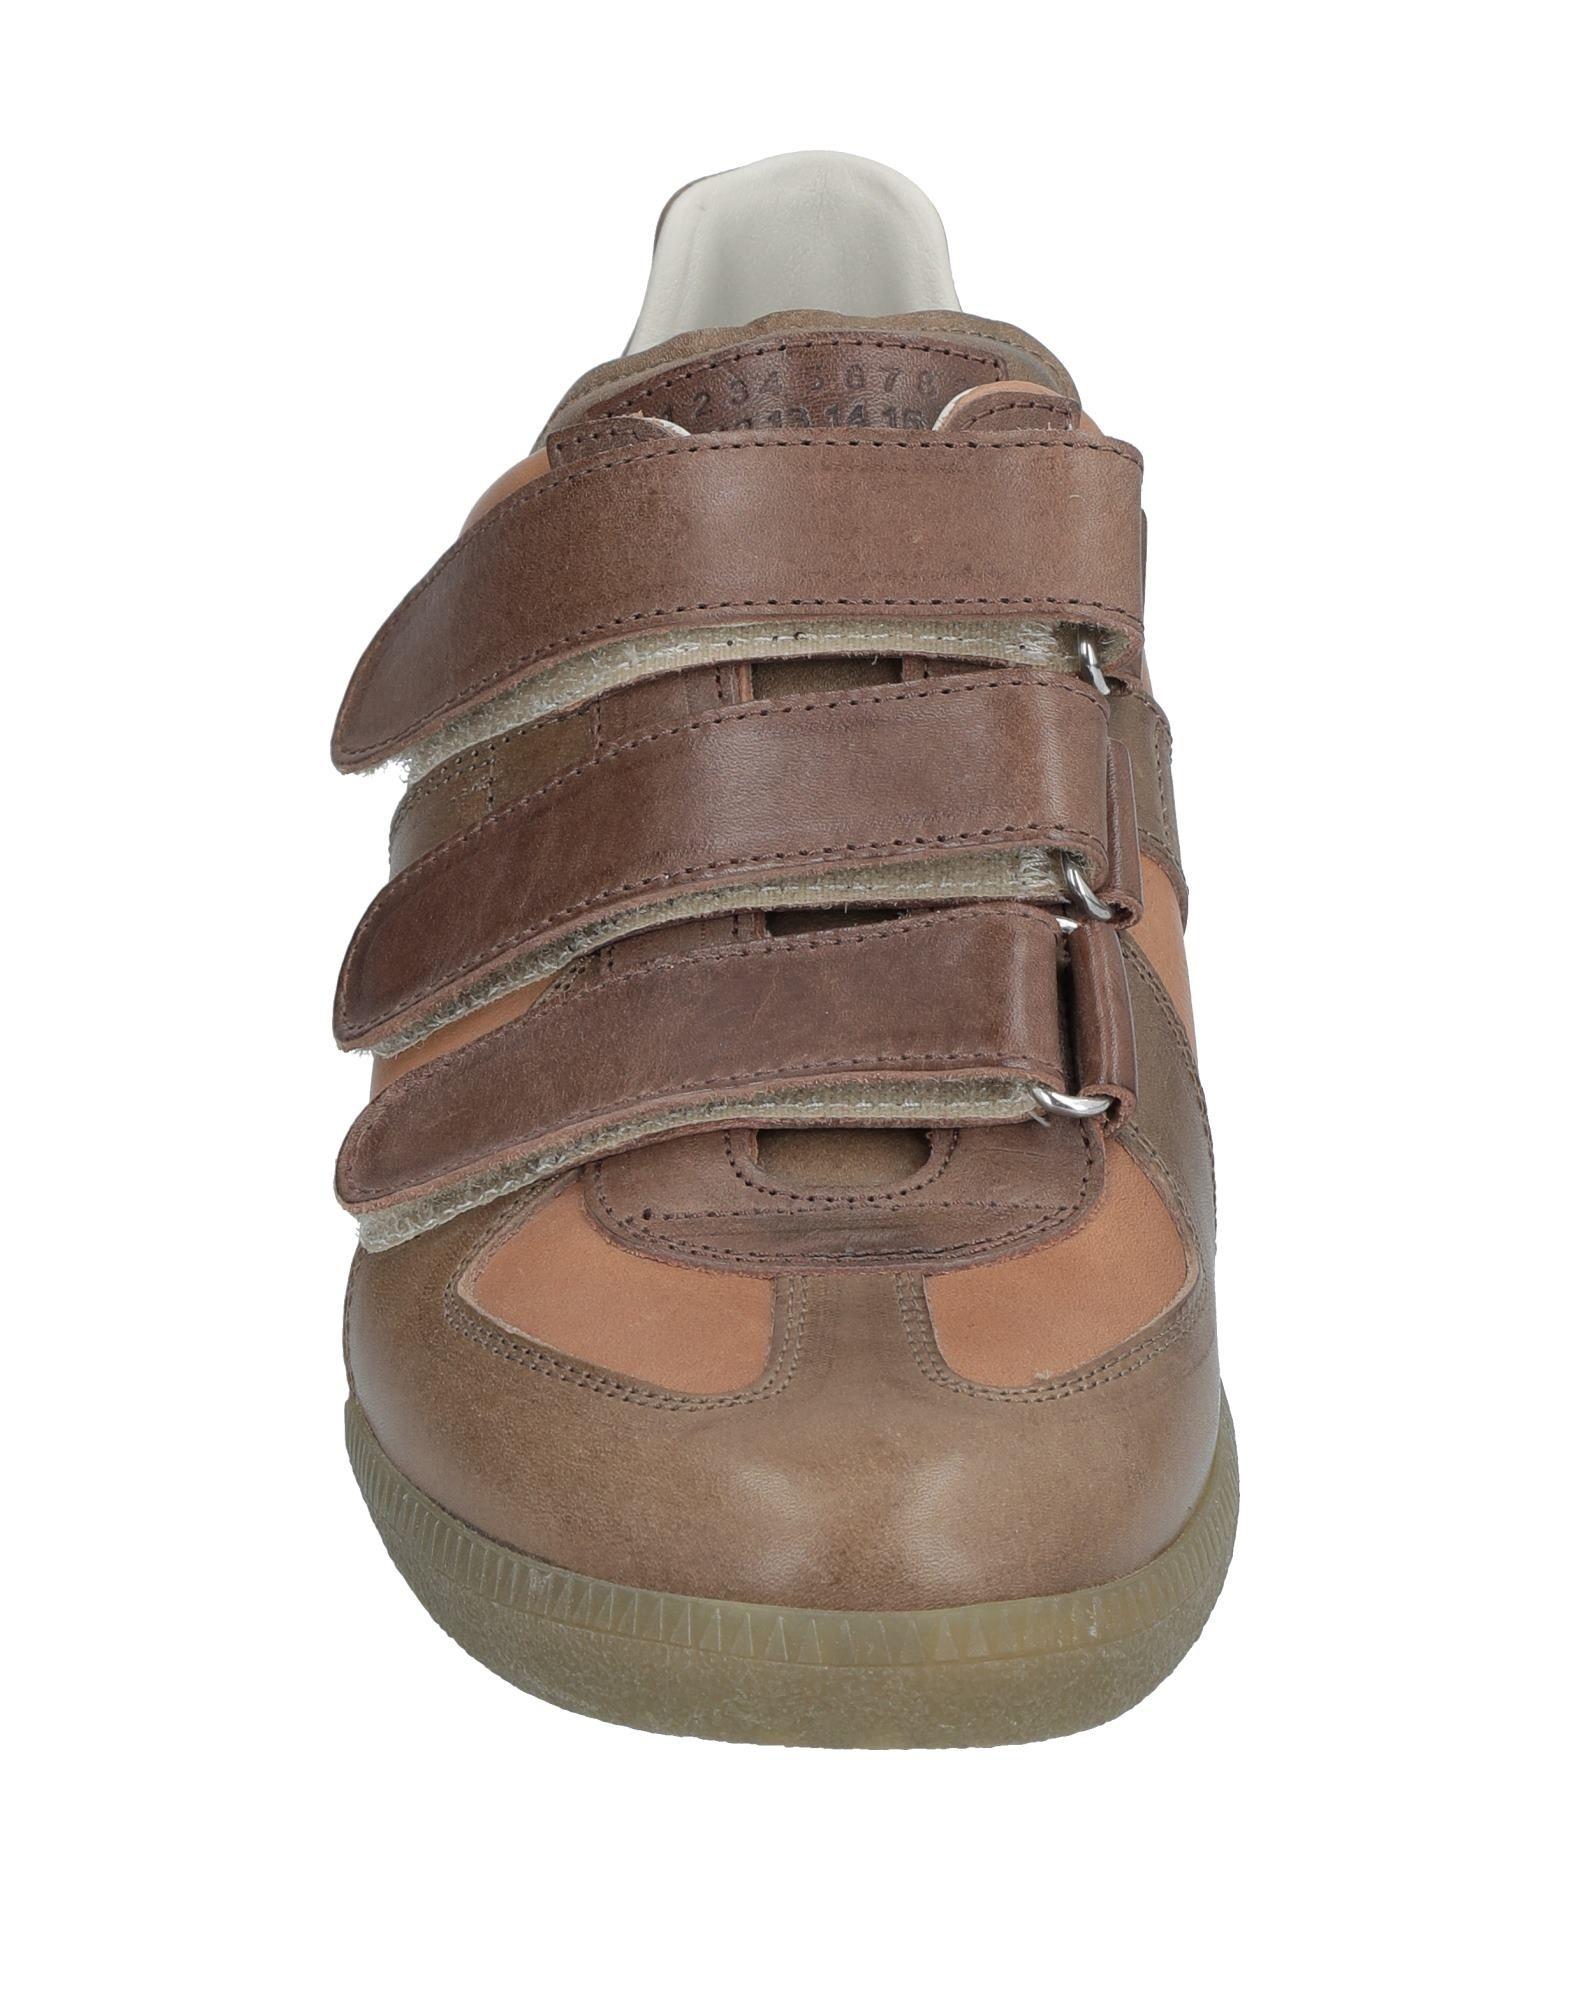 Maison Margiela Sneakers Herren  11536947IW Gute Qualität beliebte Schuhe